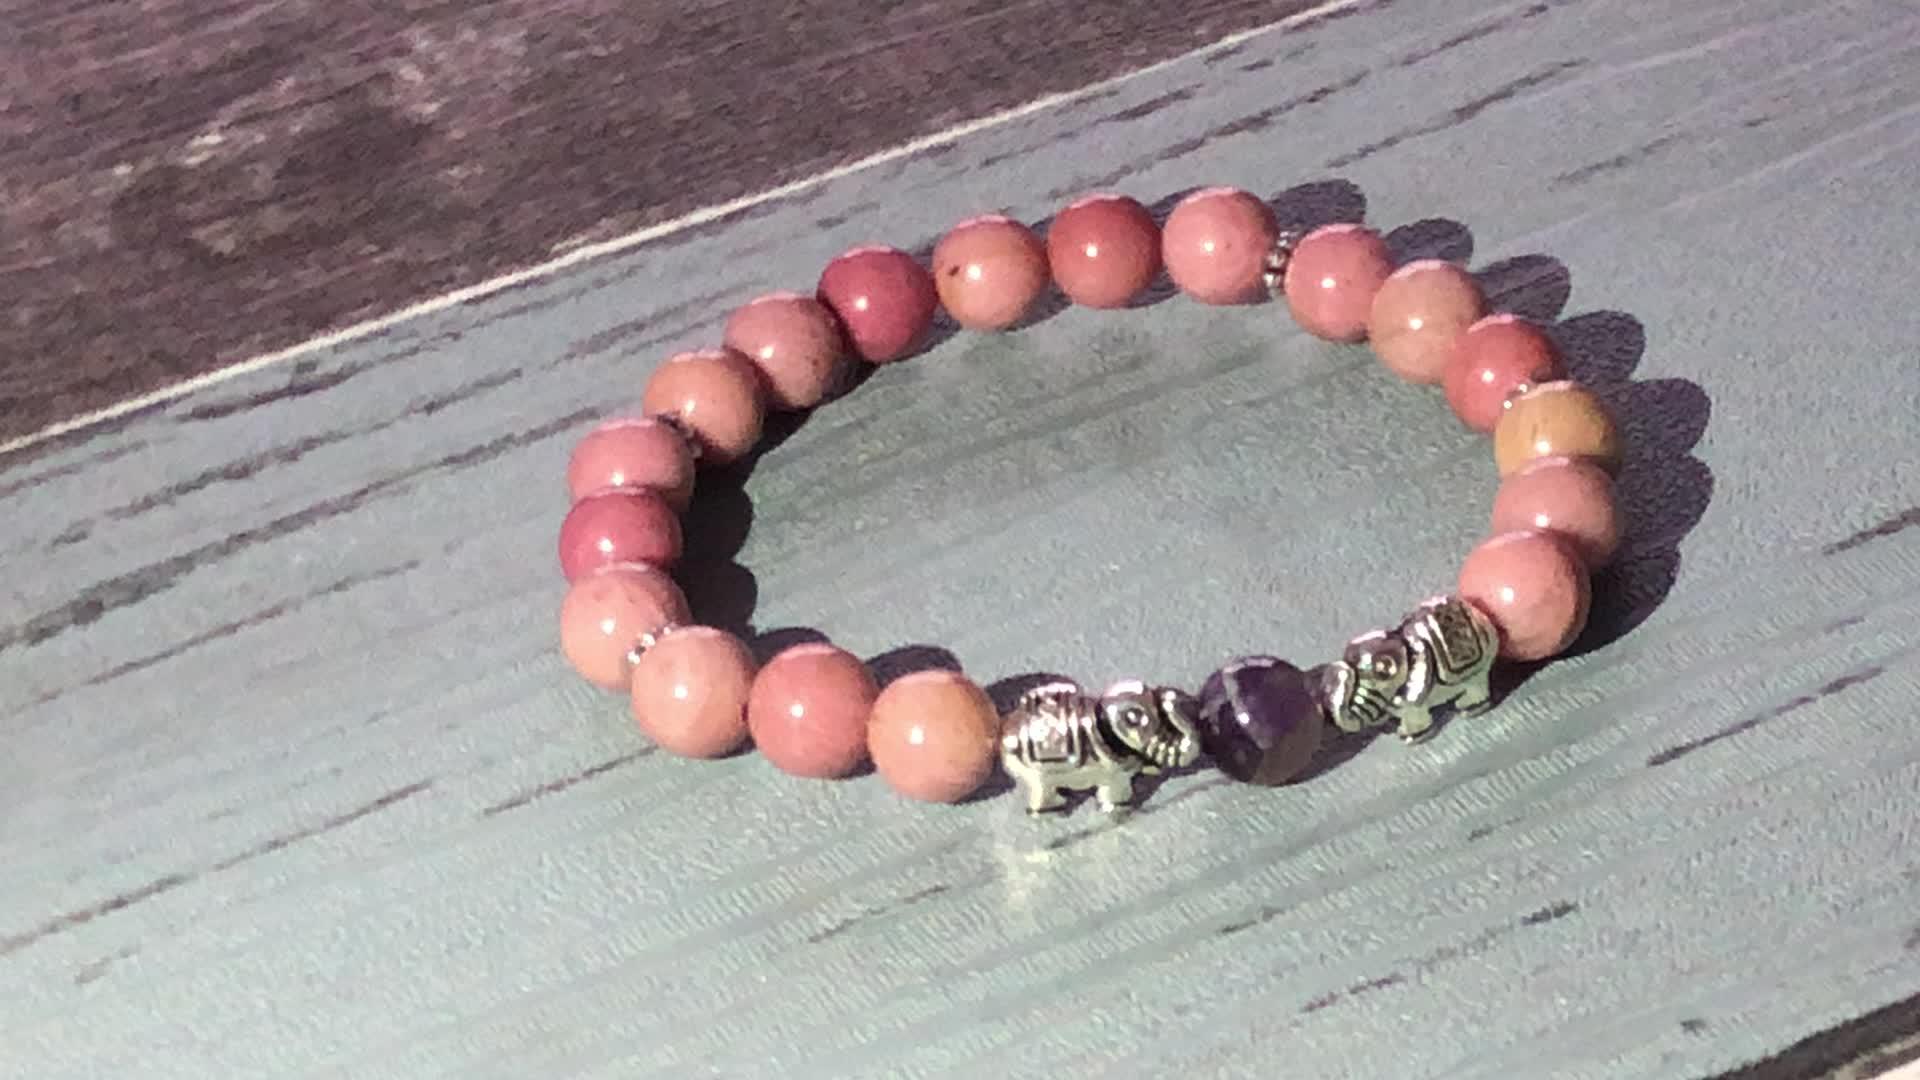 SN1640 Spirituality Bracelet For Women 8mm Meditation Beads Bracelet Aqua Terra Jasper Riverstone & Rhodonite Healing Jewelry